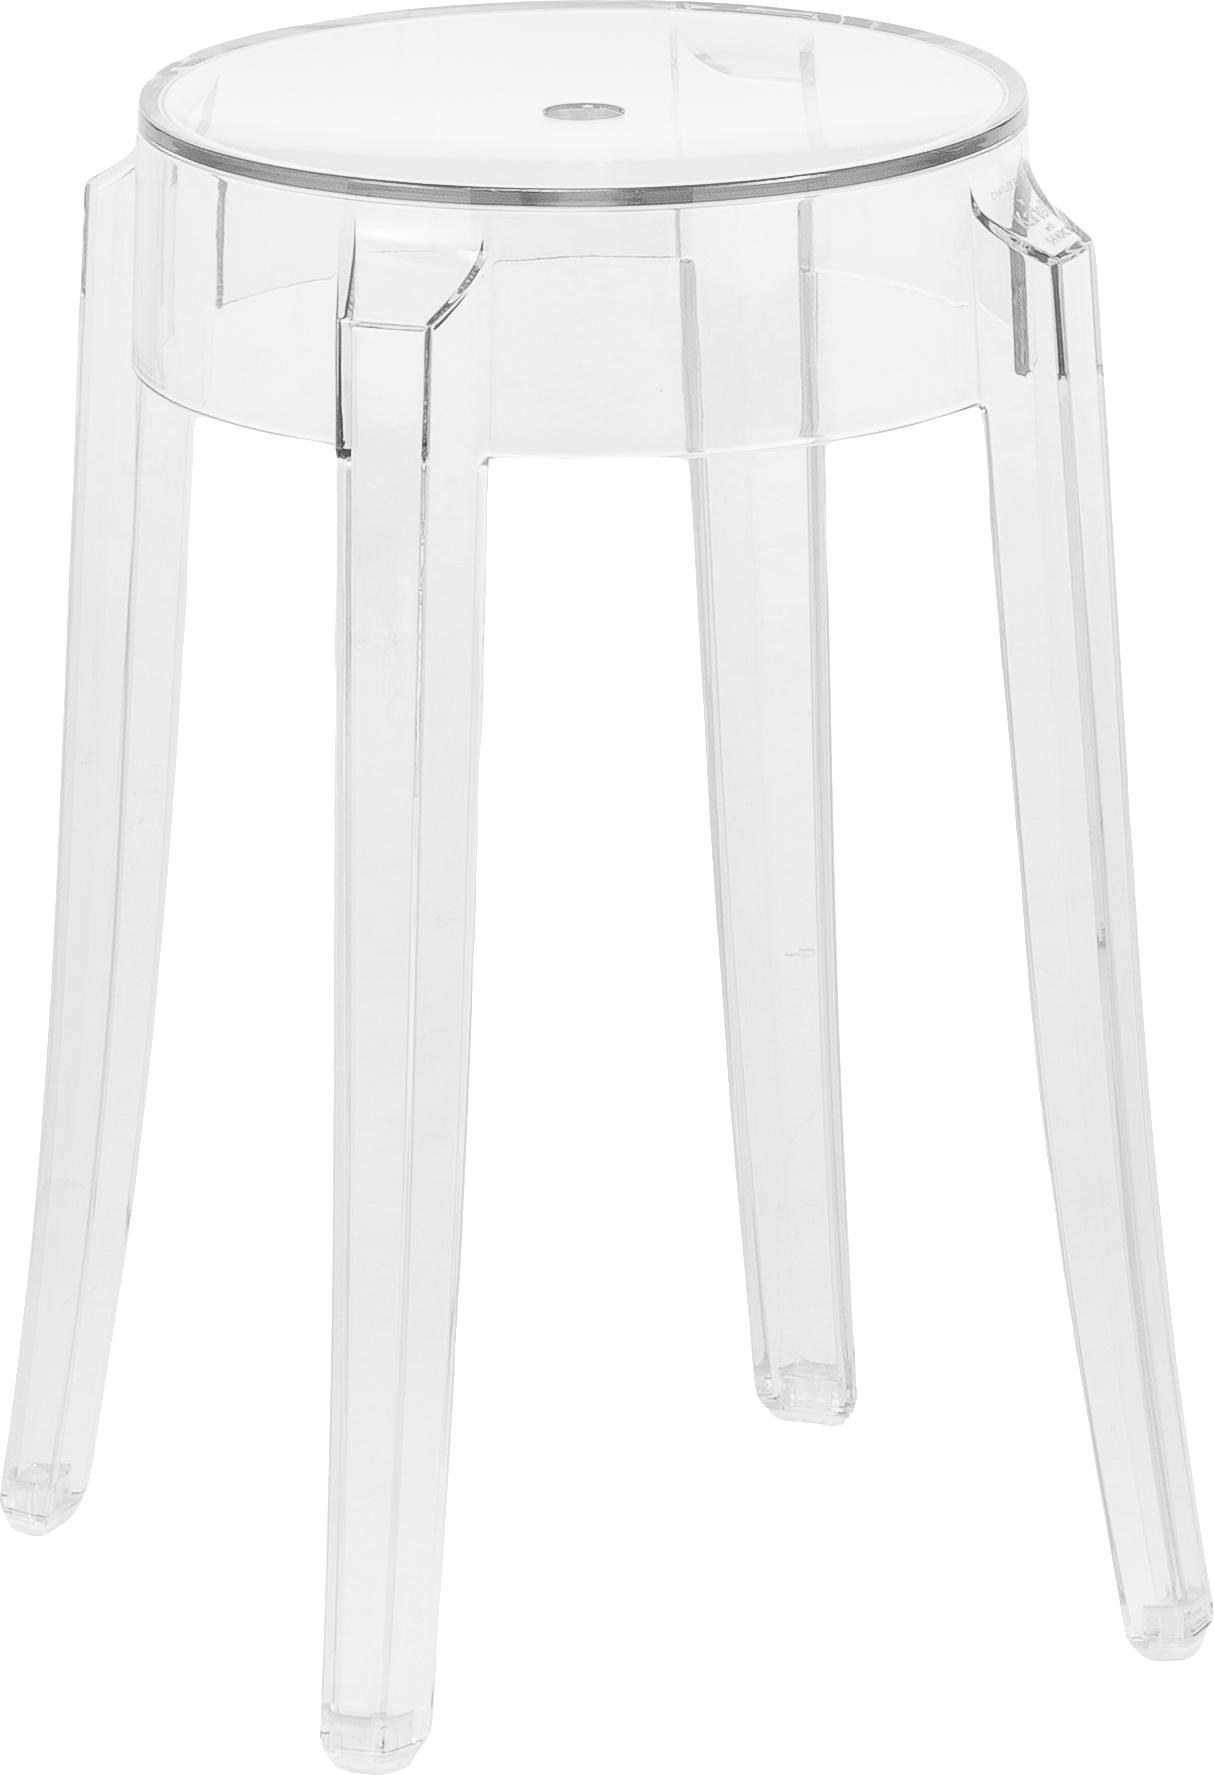 Transparante kruk Ghost, Polycarbonaat, Transparant, Ø 39 x H 46 cm